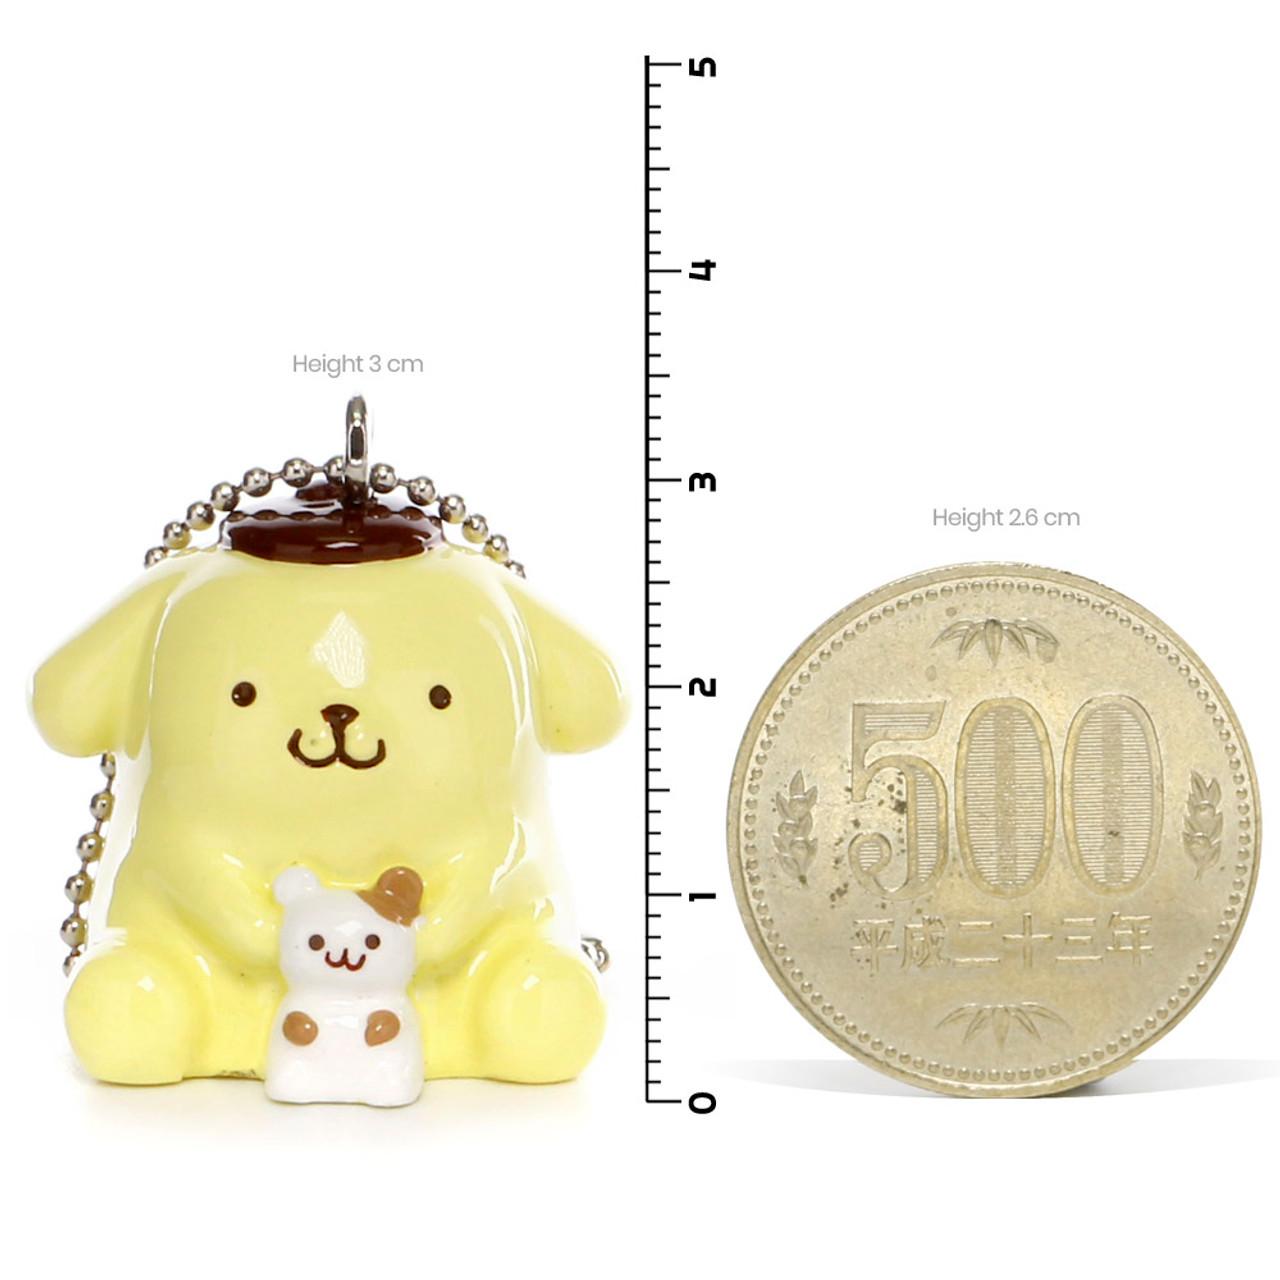 Pom Pom Purin Vinyl Mascot Charms - Hamster ( Proportion )